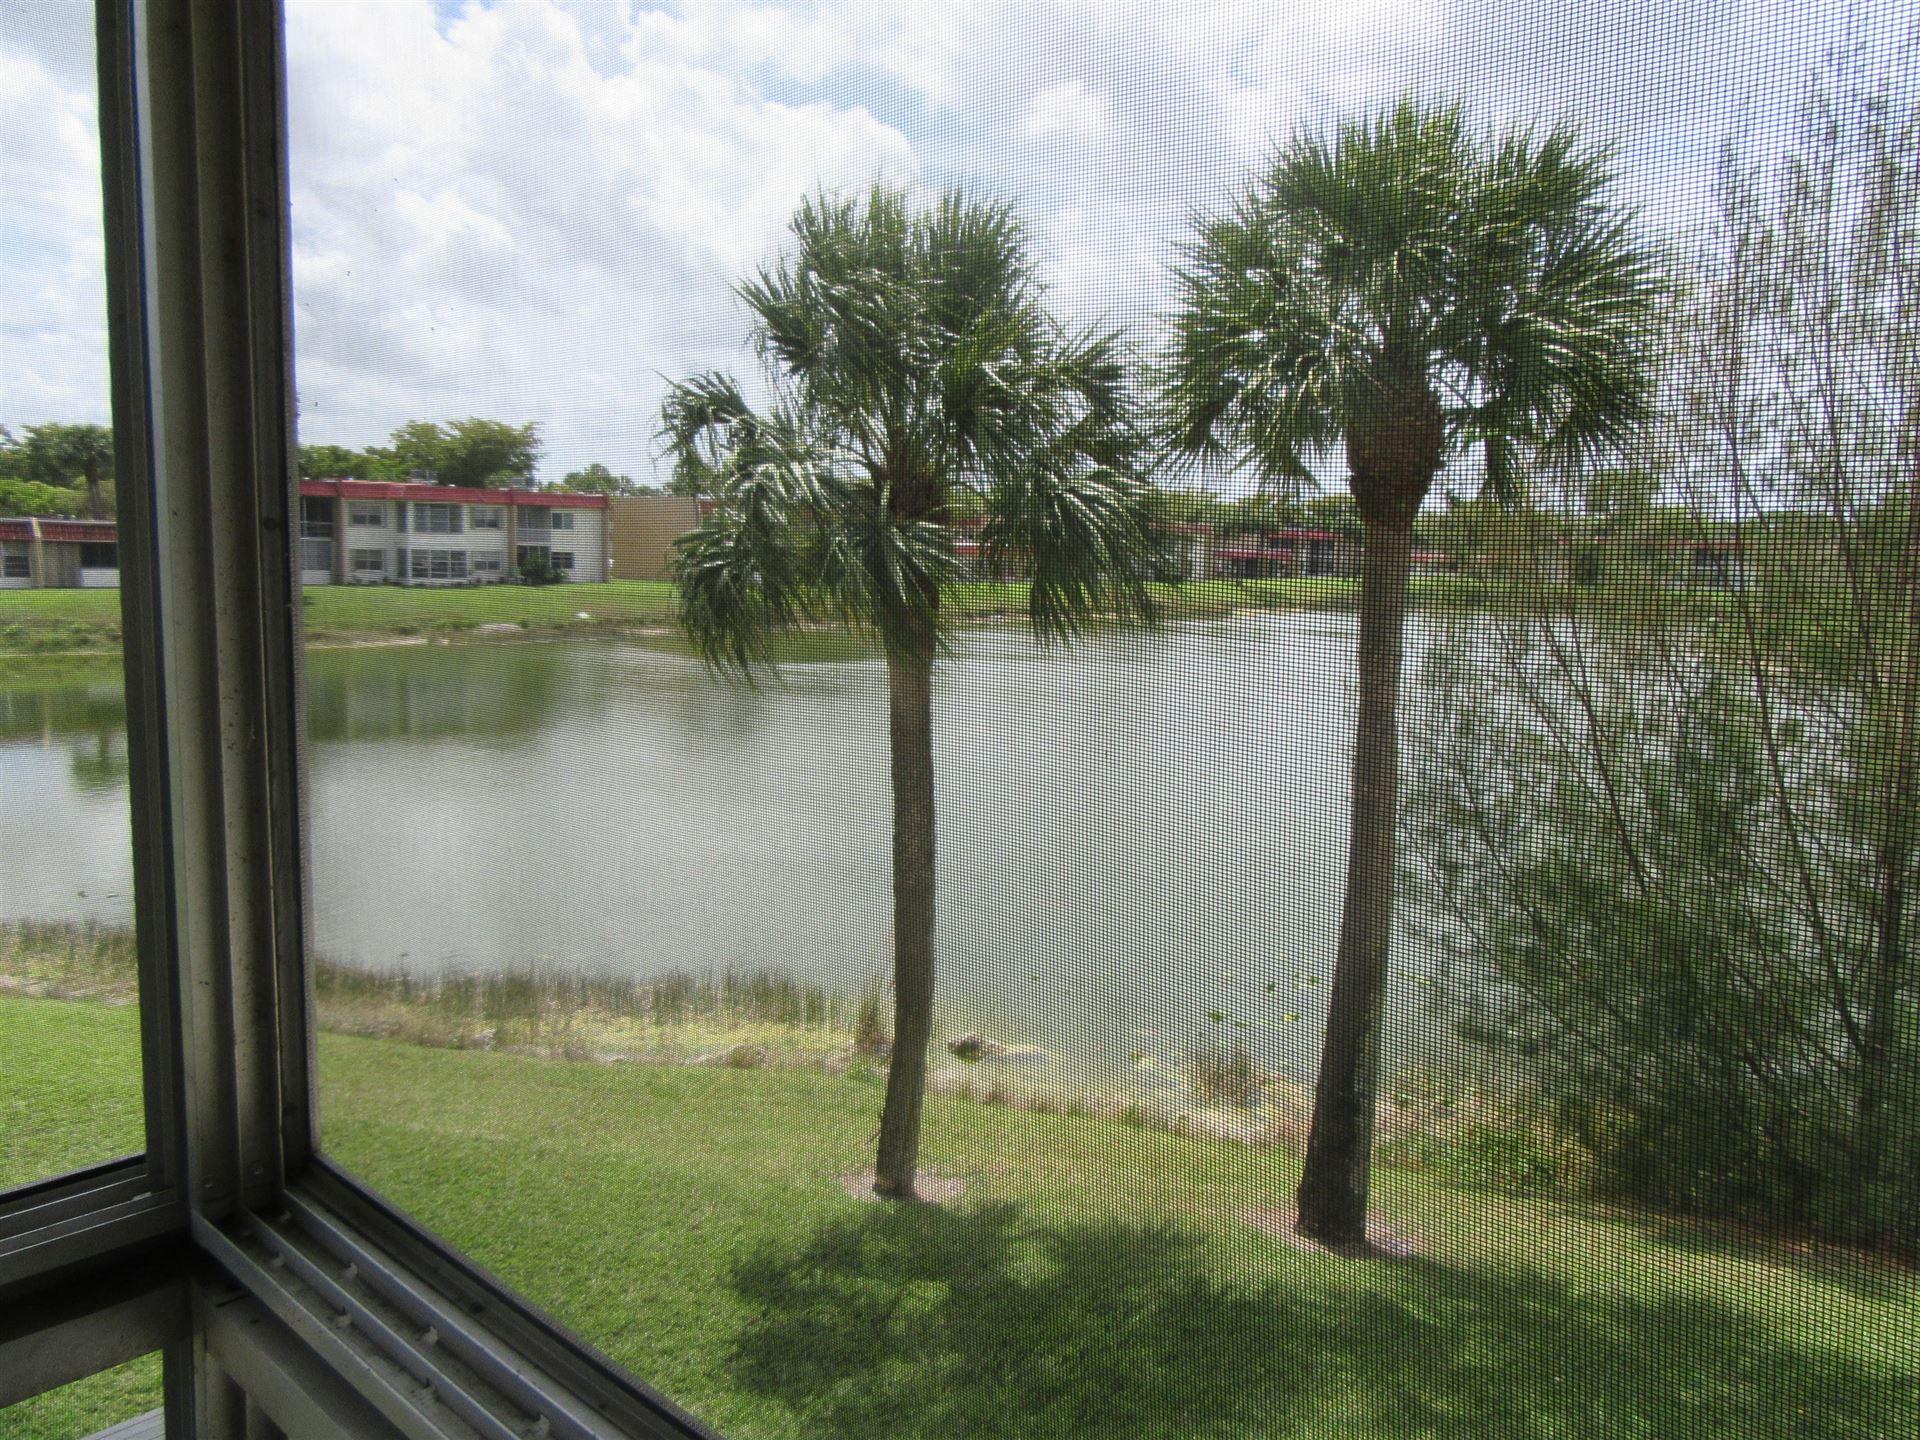 353 Lake Frances Drive, West Palm Beach, FL 33411 - MLS#: RX-10704476